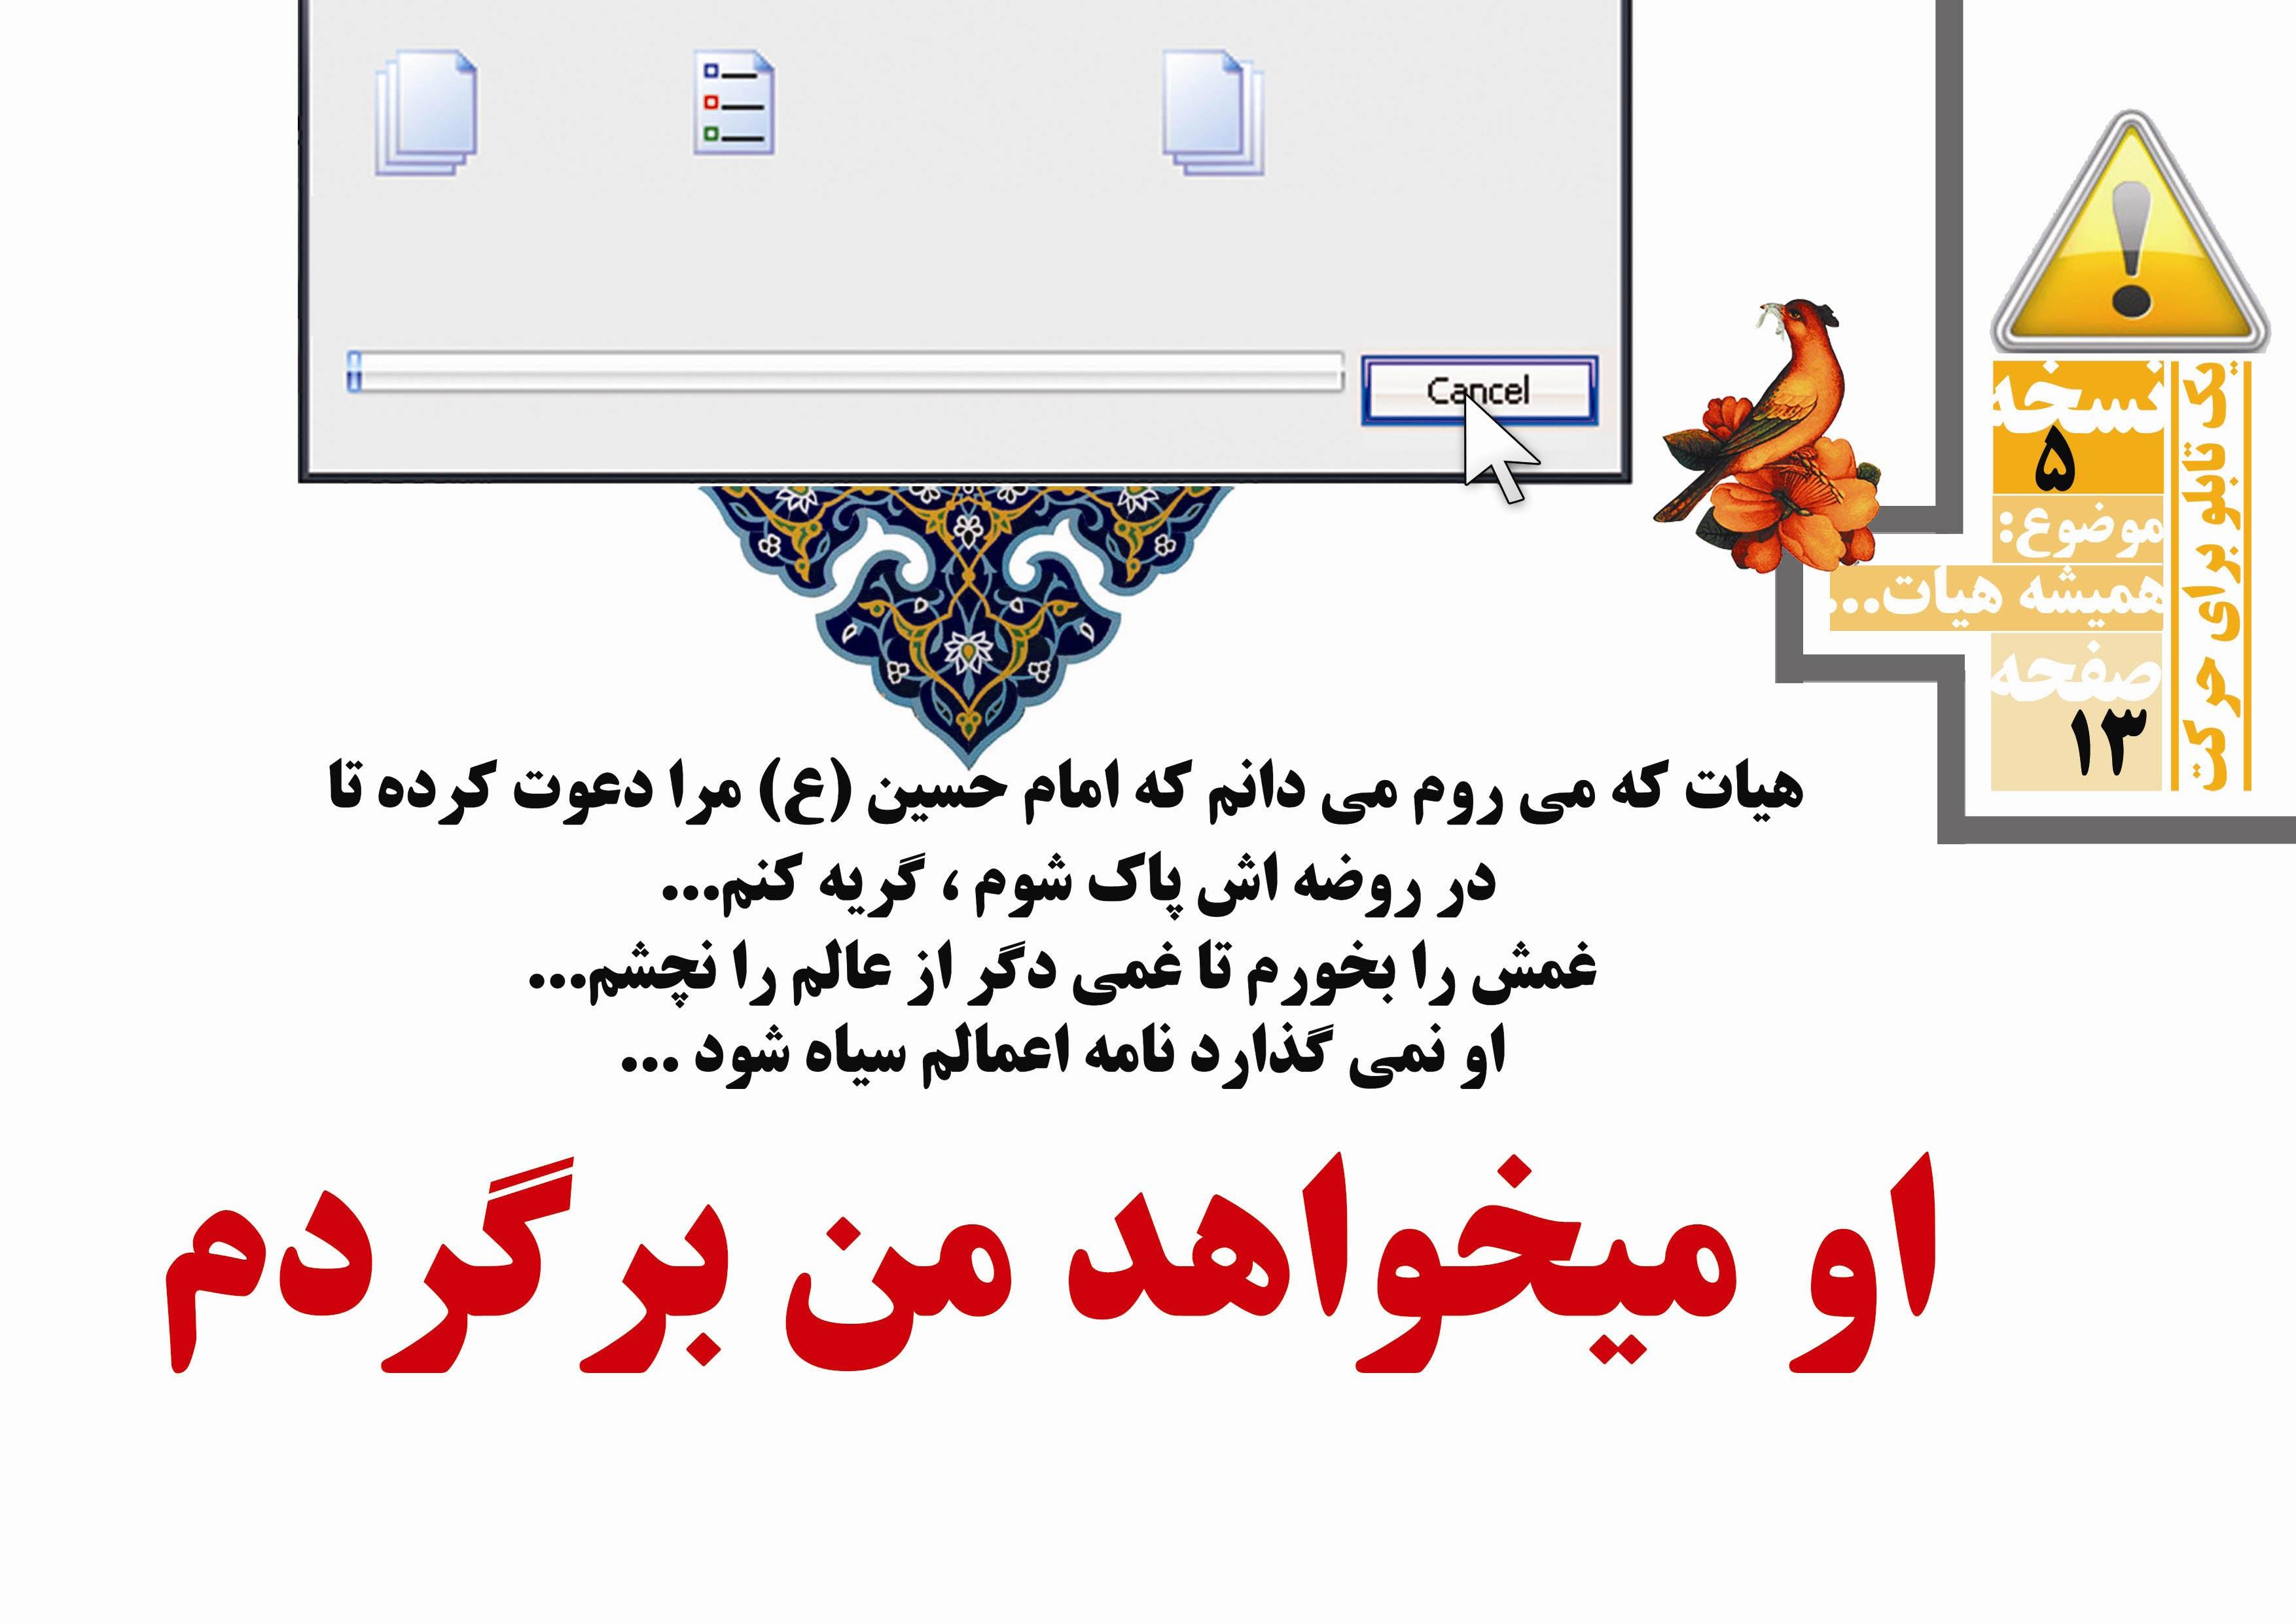 http://dl.aviny.com/karikator/mozoei/hey%27at/kamel/13.jpg